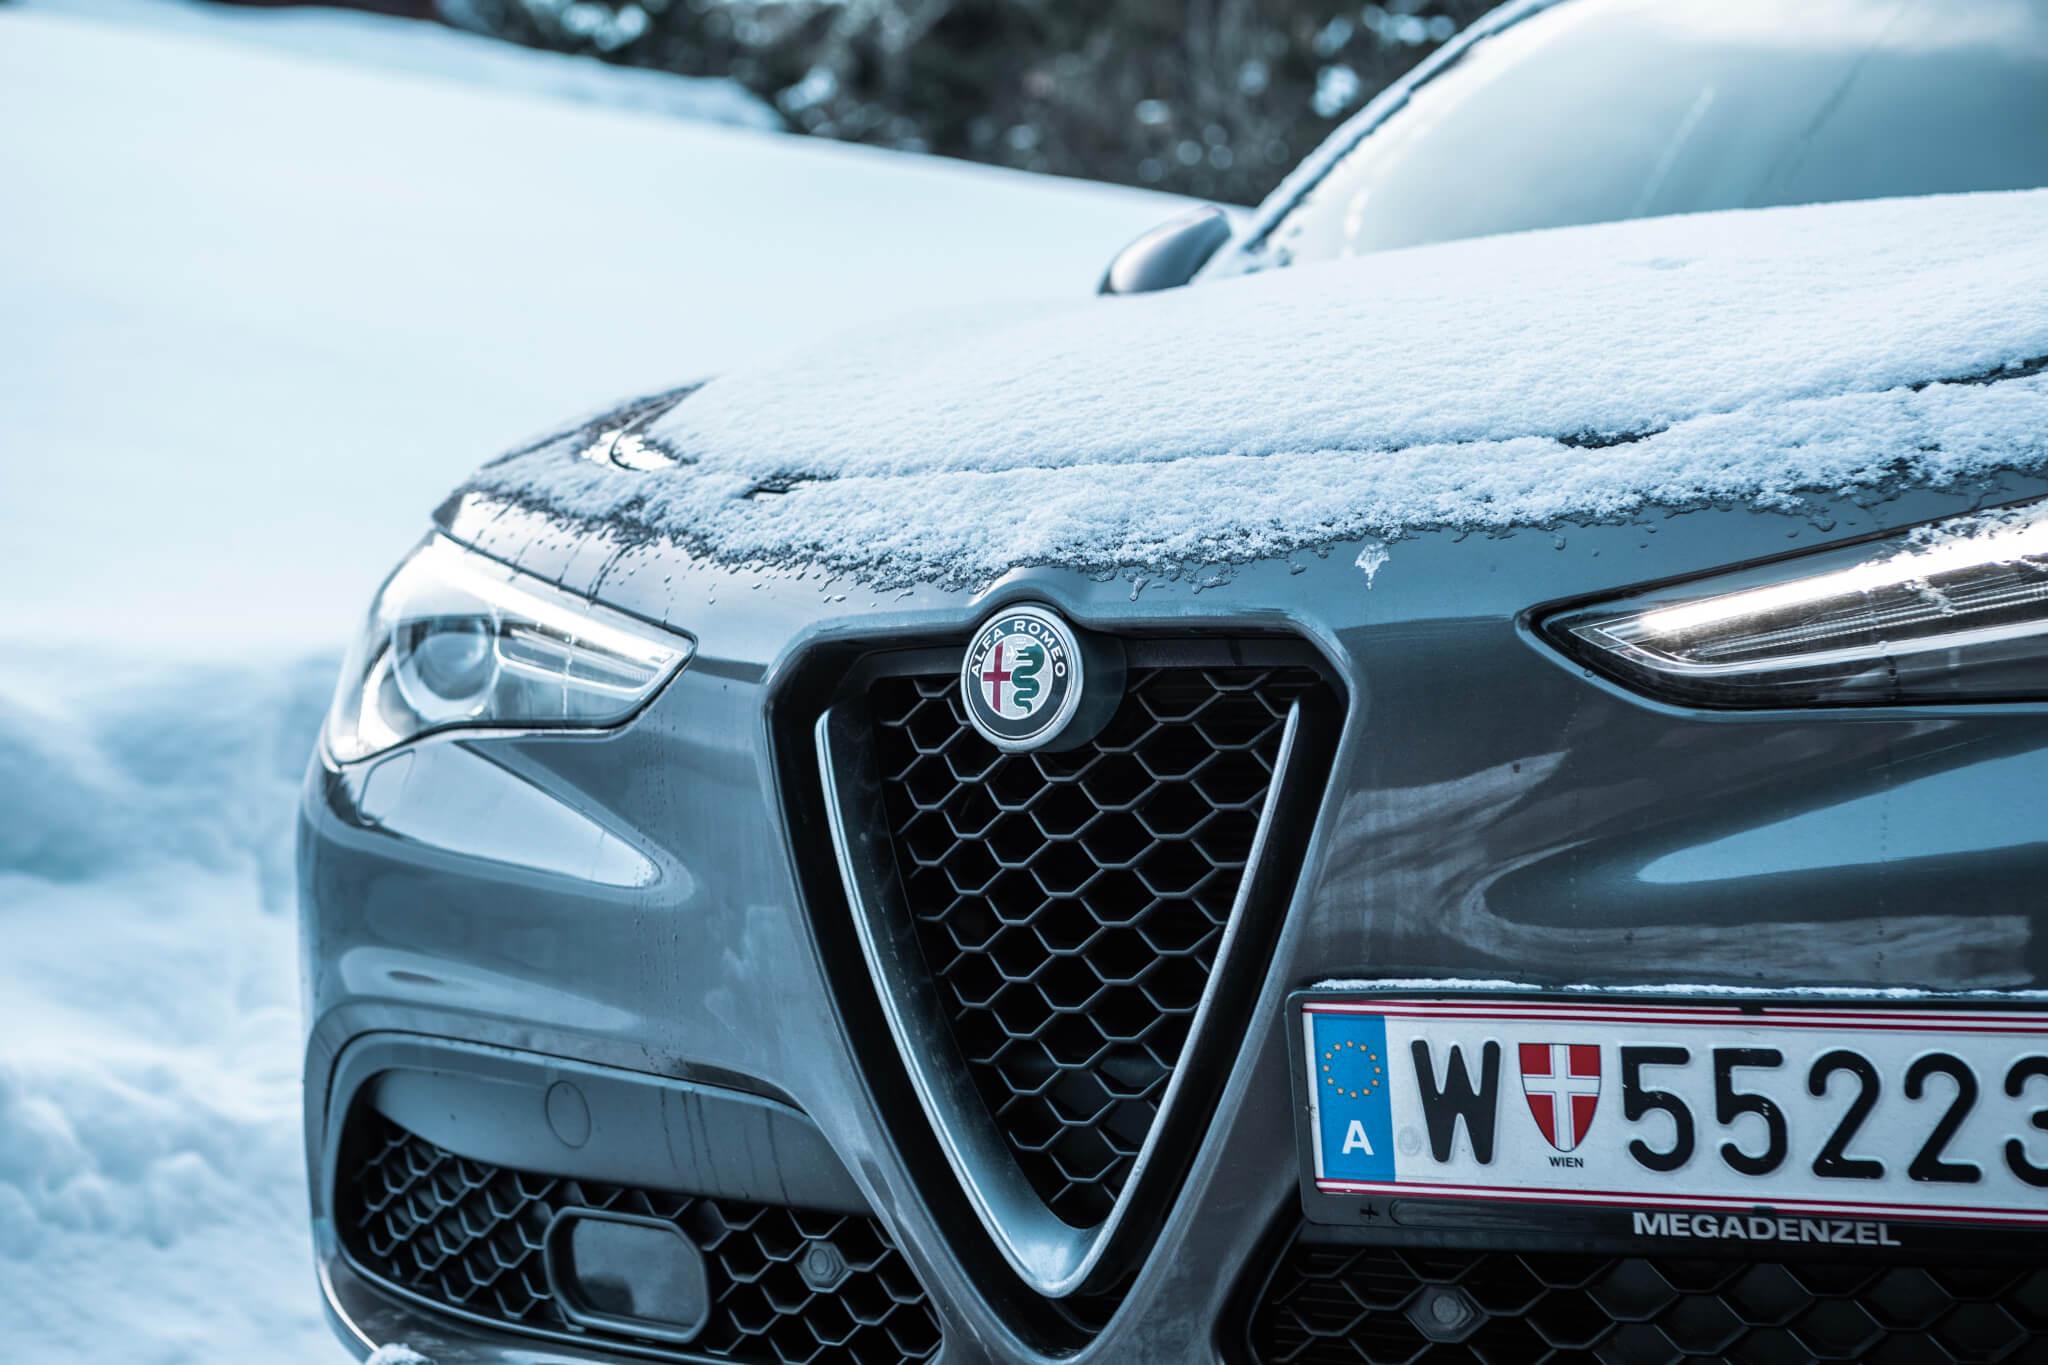 Alfa Romeo Stelvio Denzel Fotos Raphael Berthold (54)